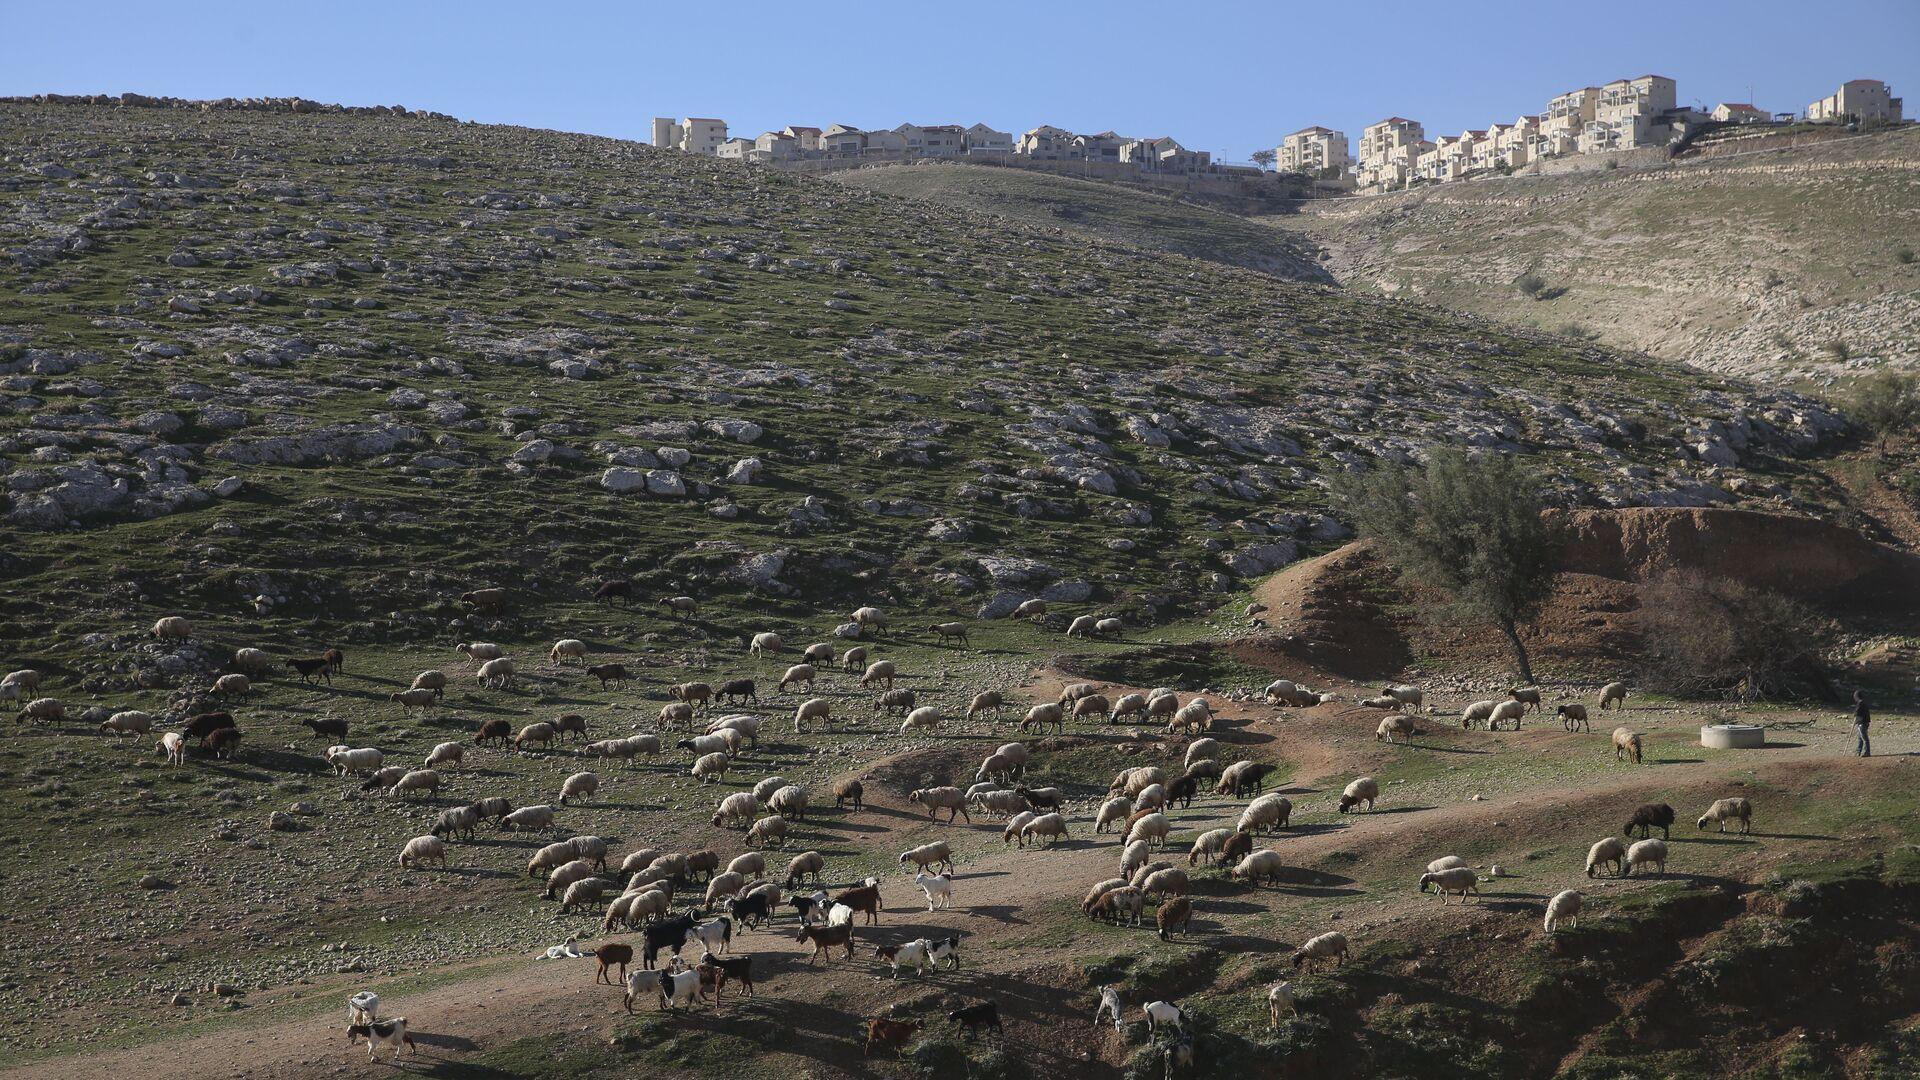 Un asentamiento israelí en Cisjordania - Sputnik Mundo, 1920, 06.05.2021